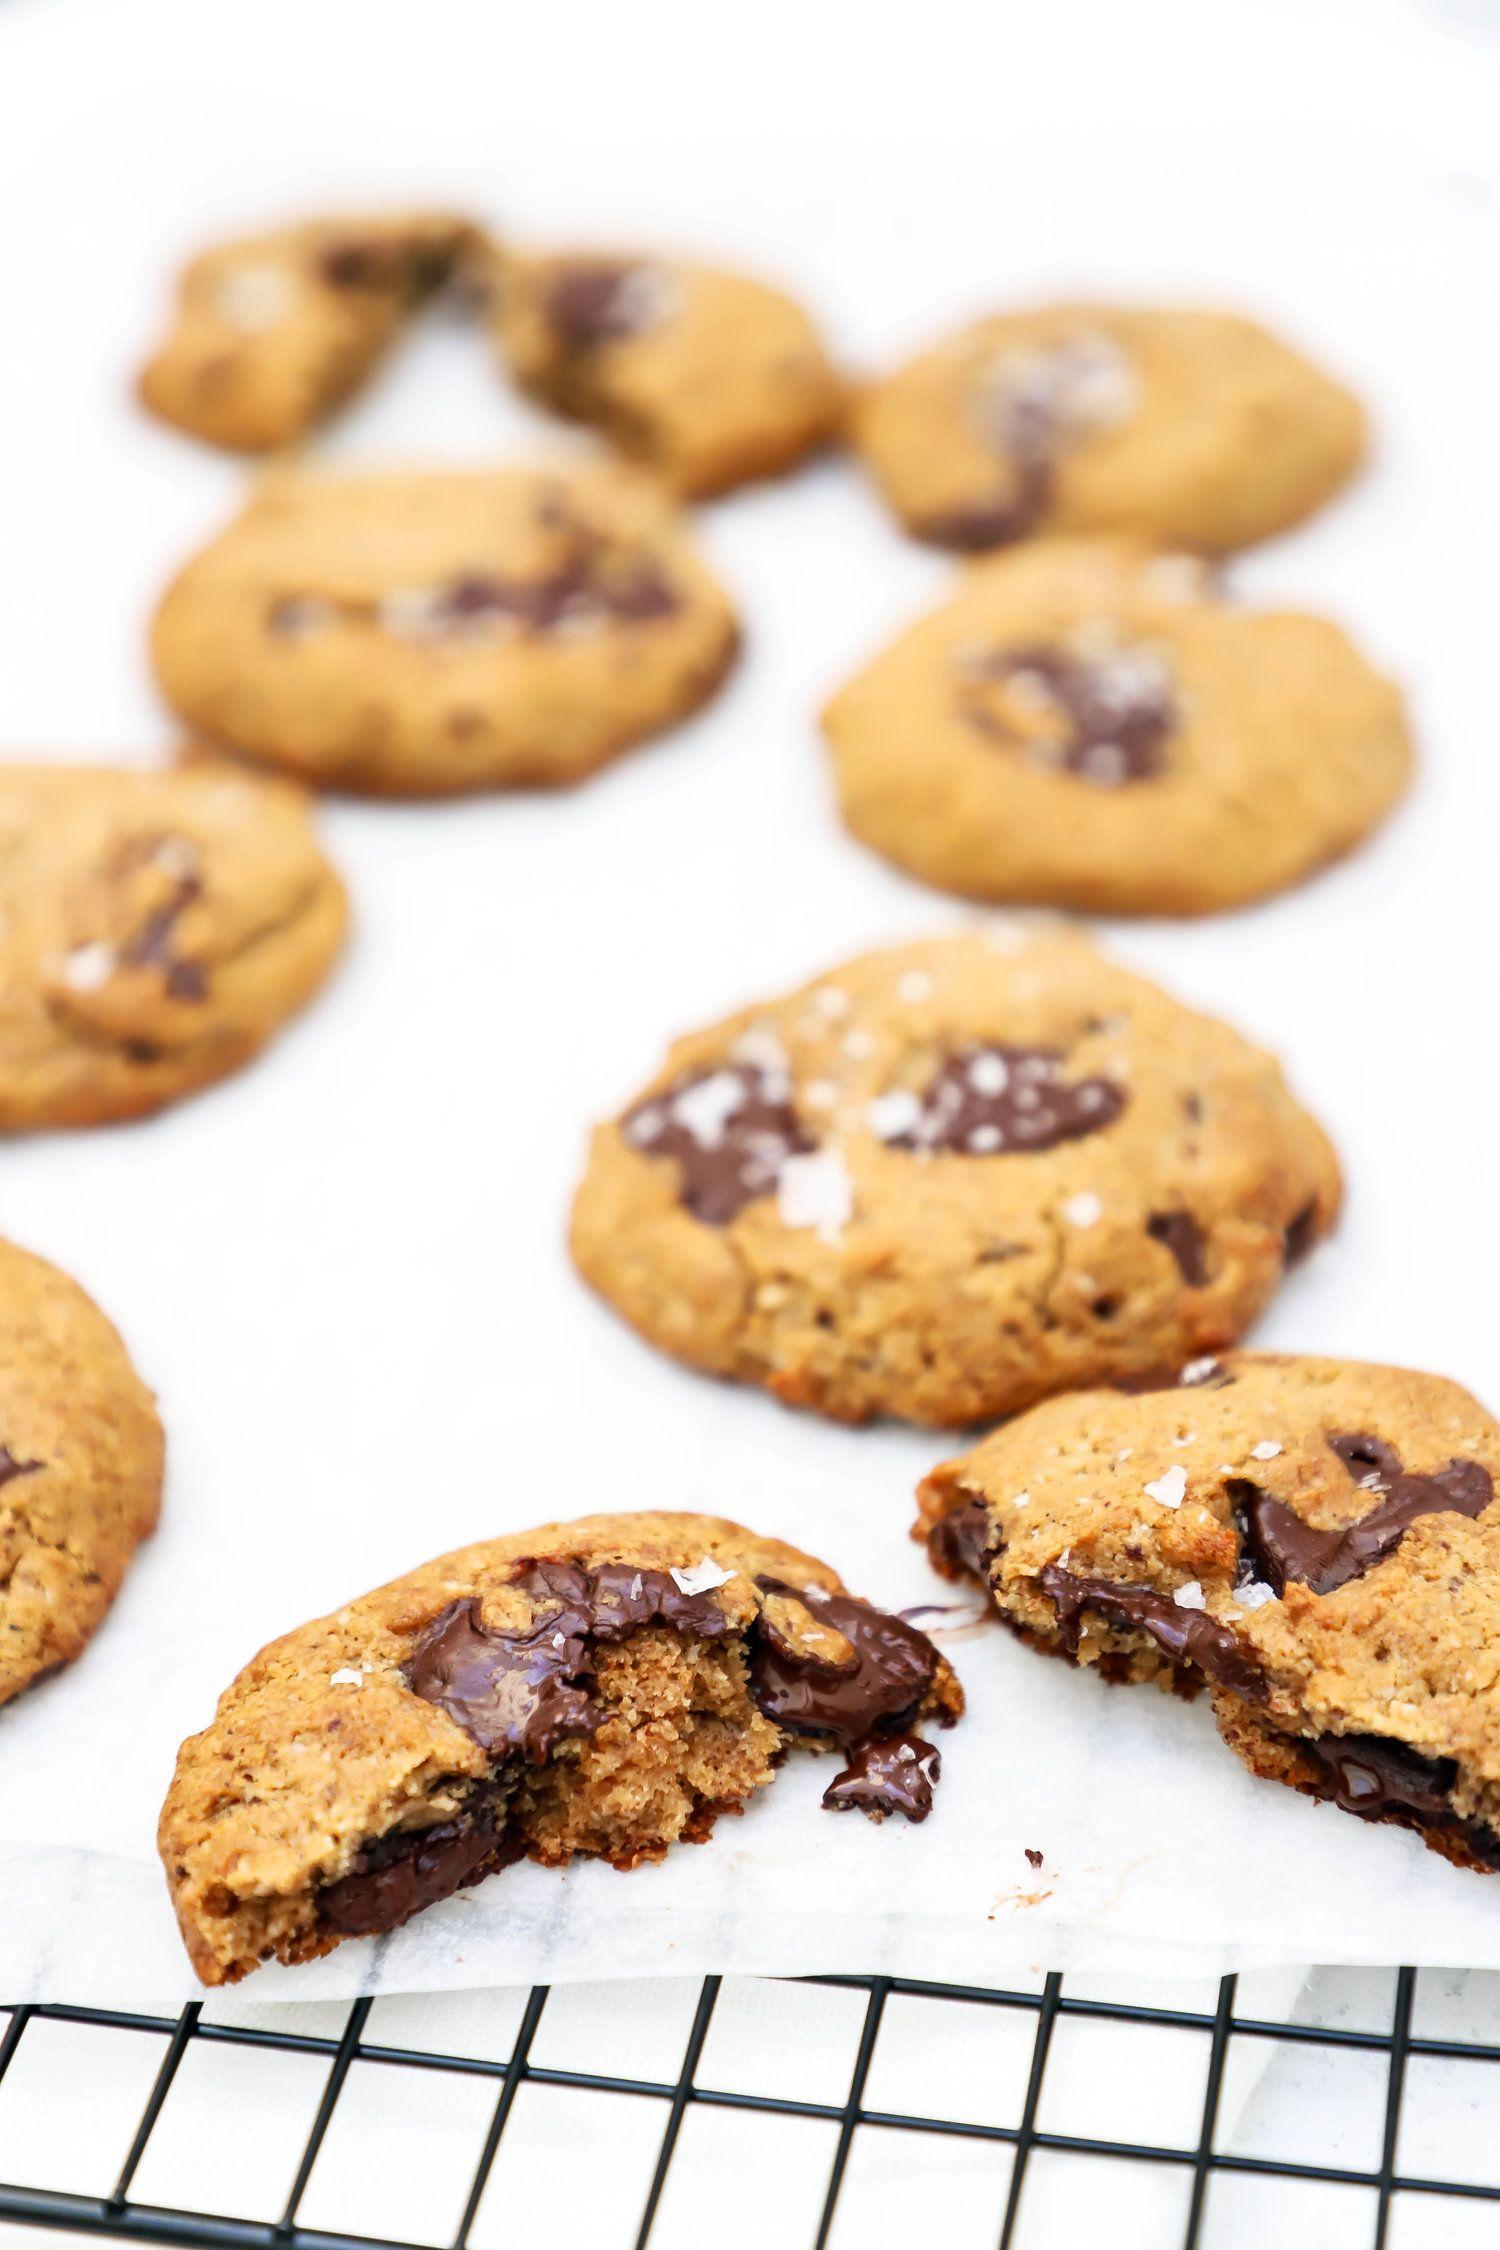 Vegan And Gluten Free Chocolate Chip Cookies